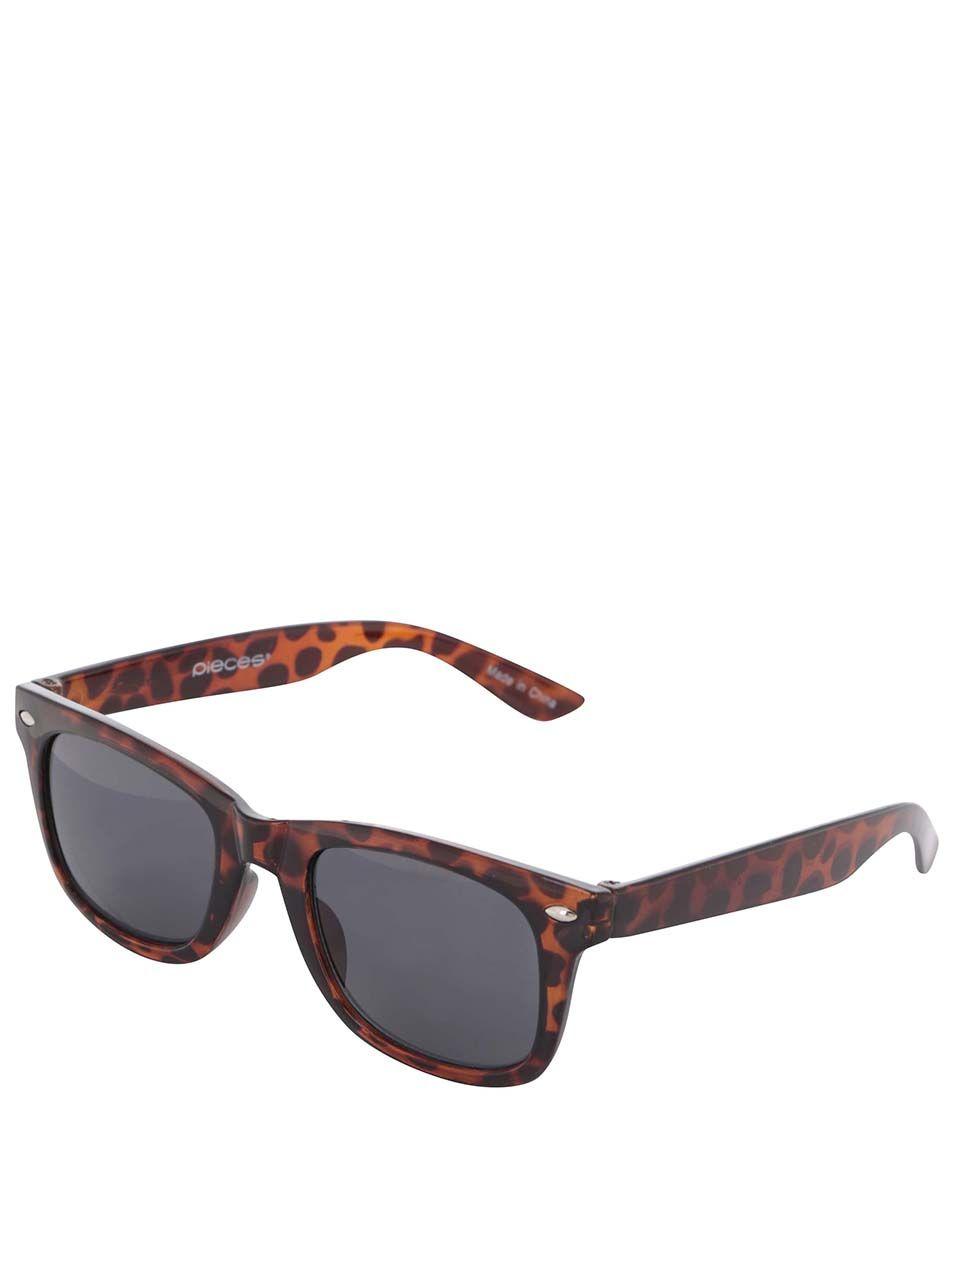 73fdee58b Hnedé korytnačinové slnečné okuliare Pieces Vibba | MUST HAVE ...